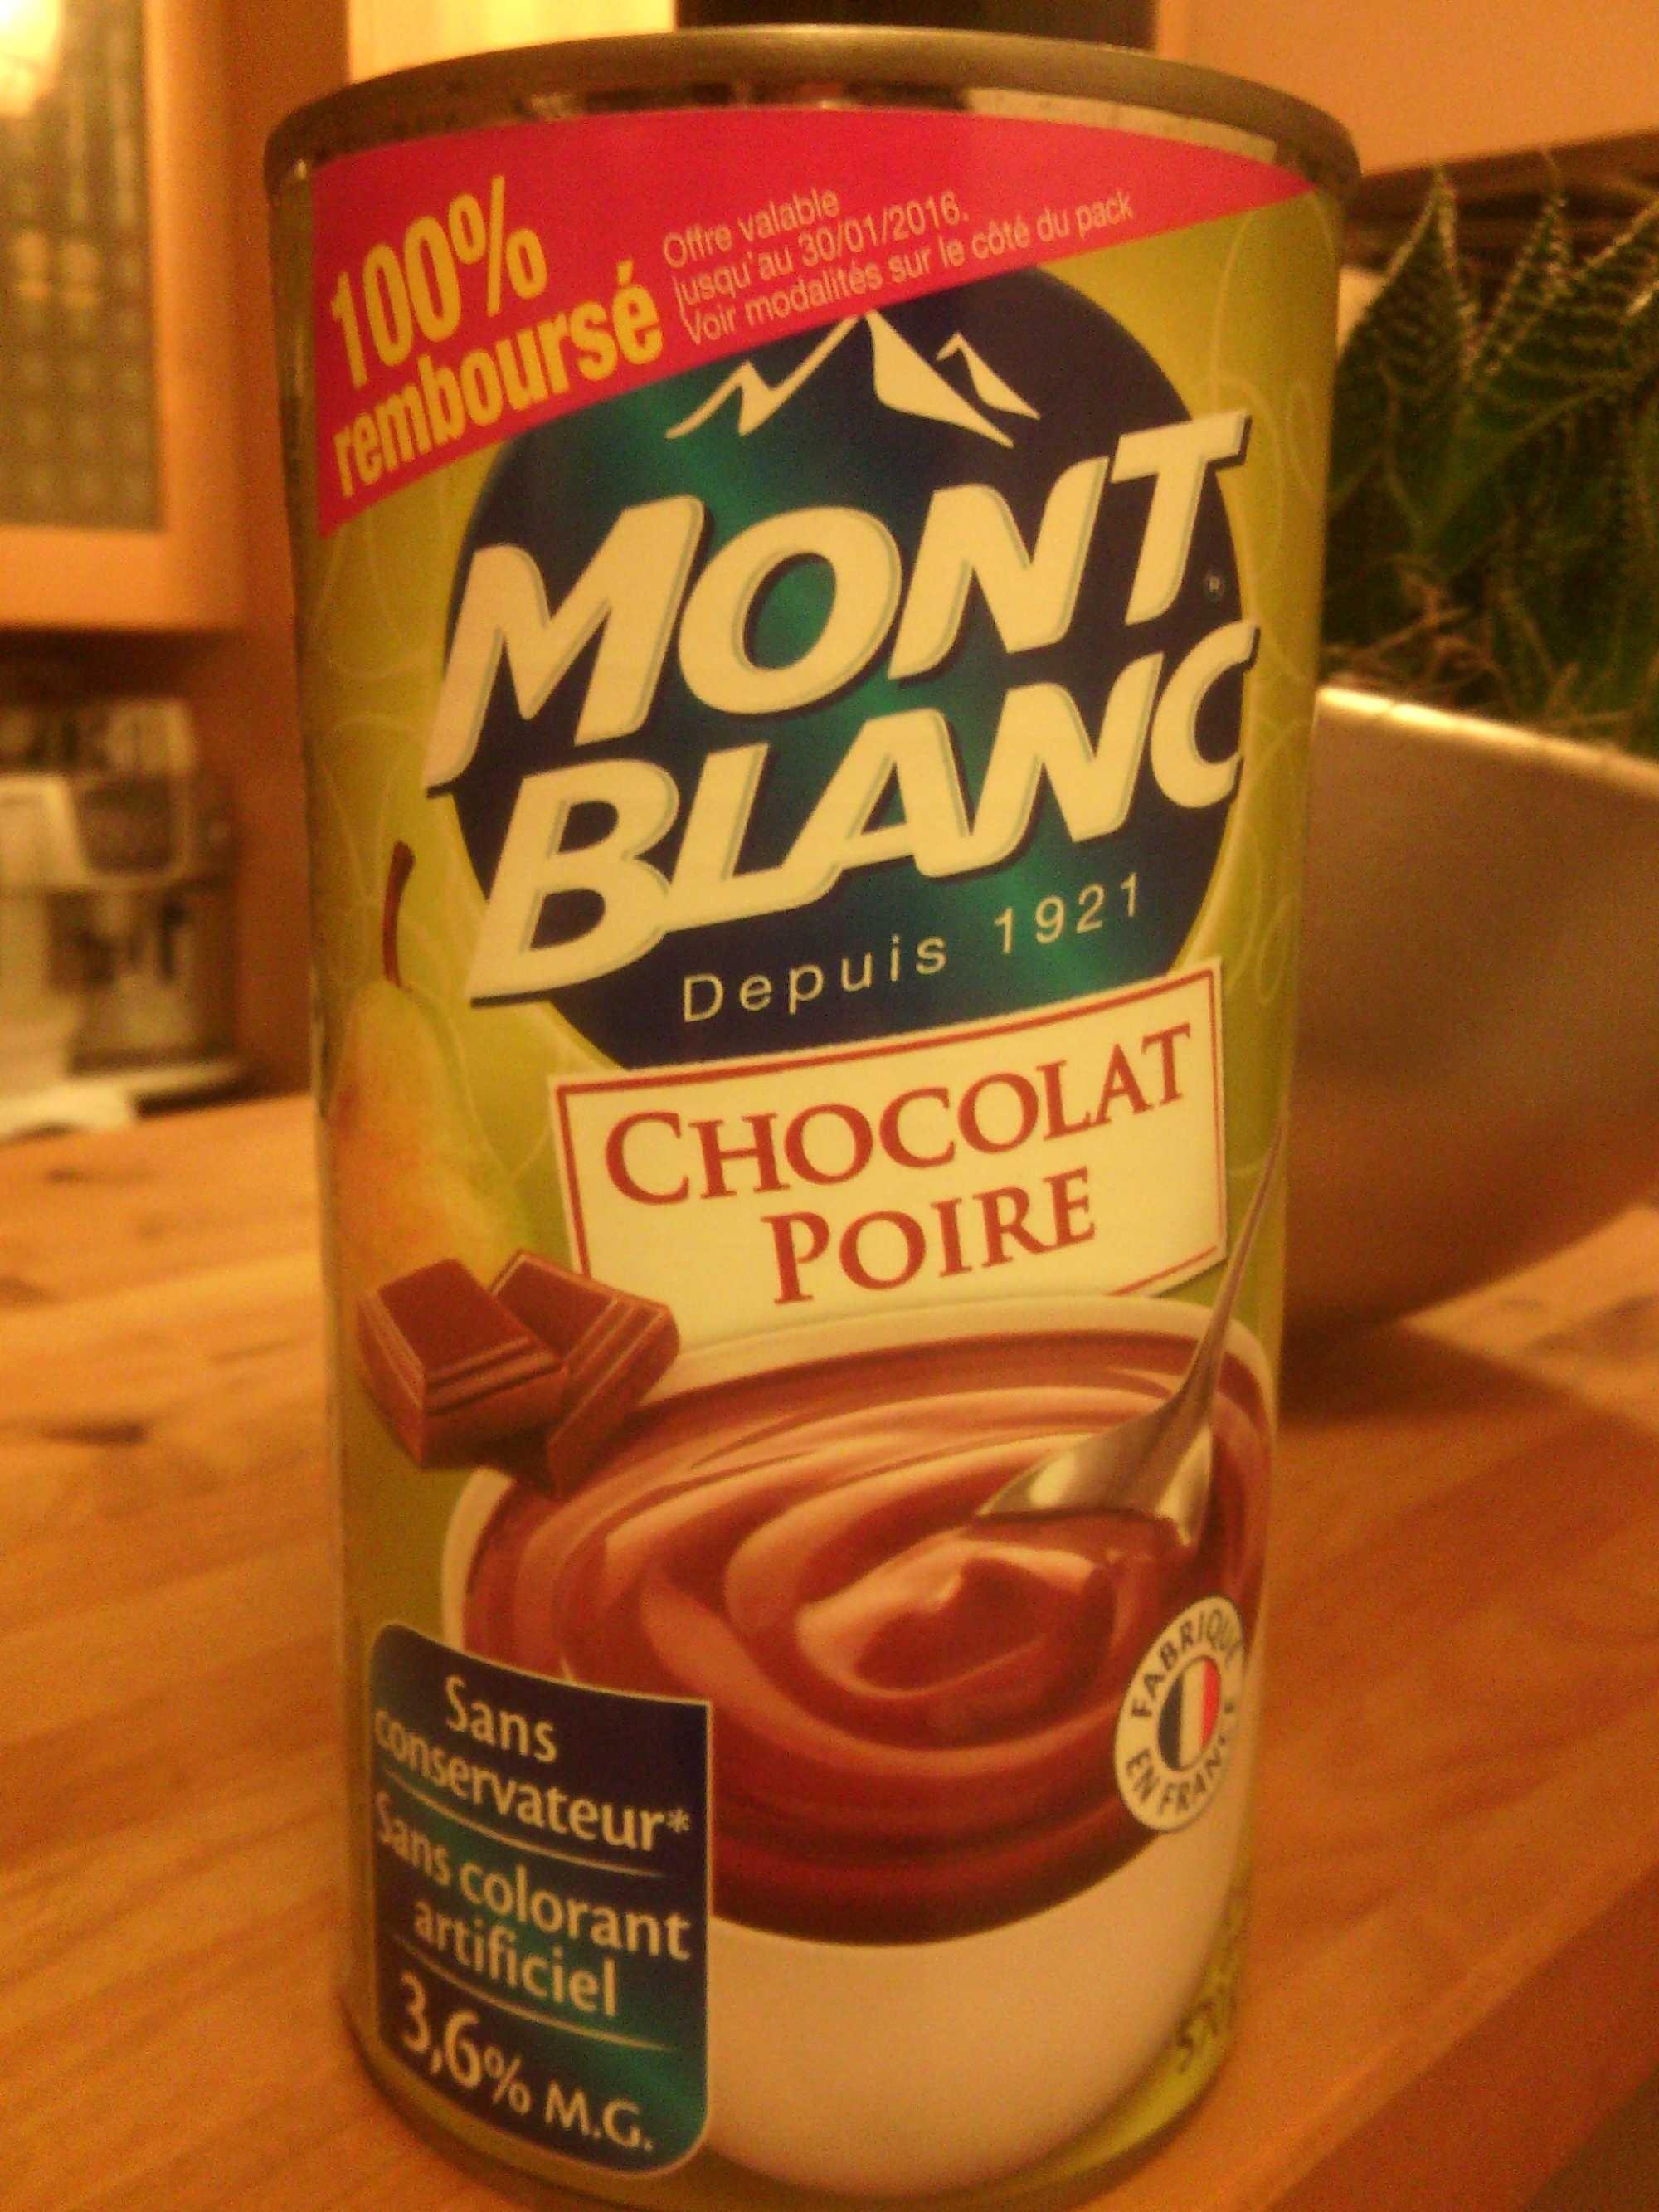 chocolat poire 3 6 mg mont blanc 570 g. Black Bedroom Furniture Sets. Home Design Ideas